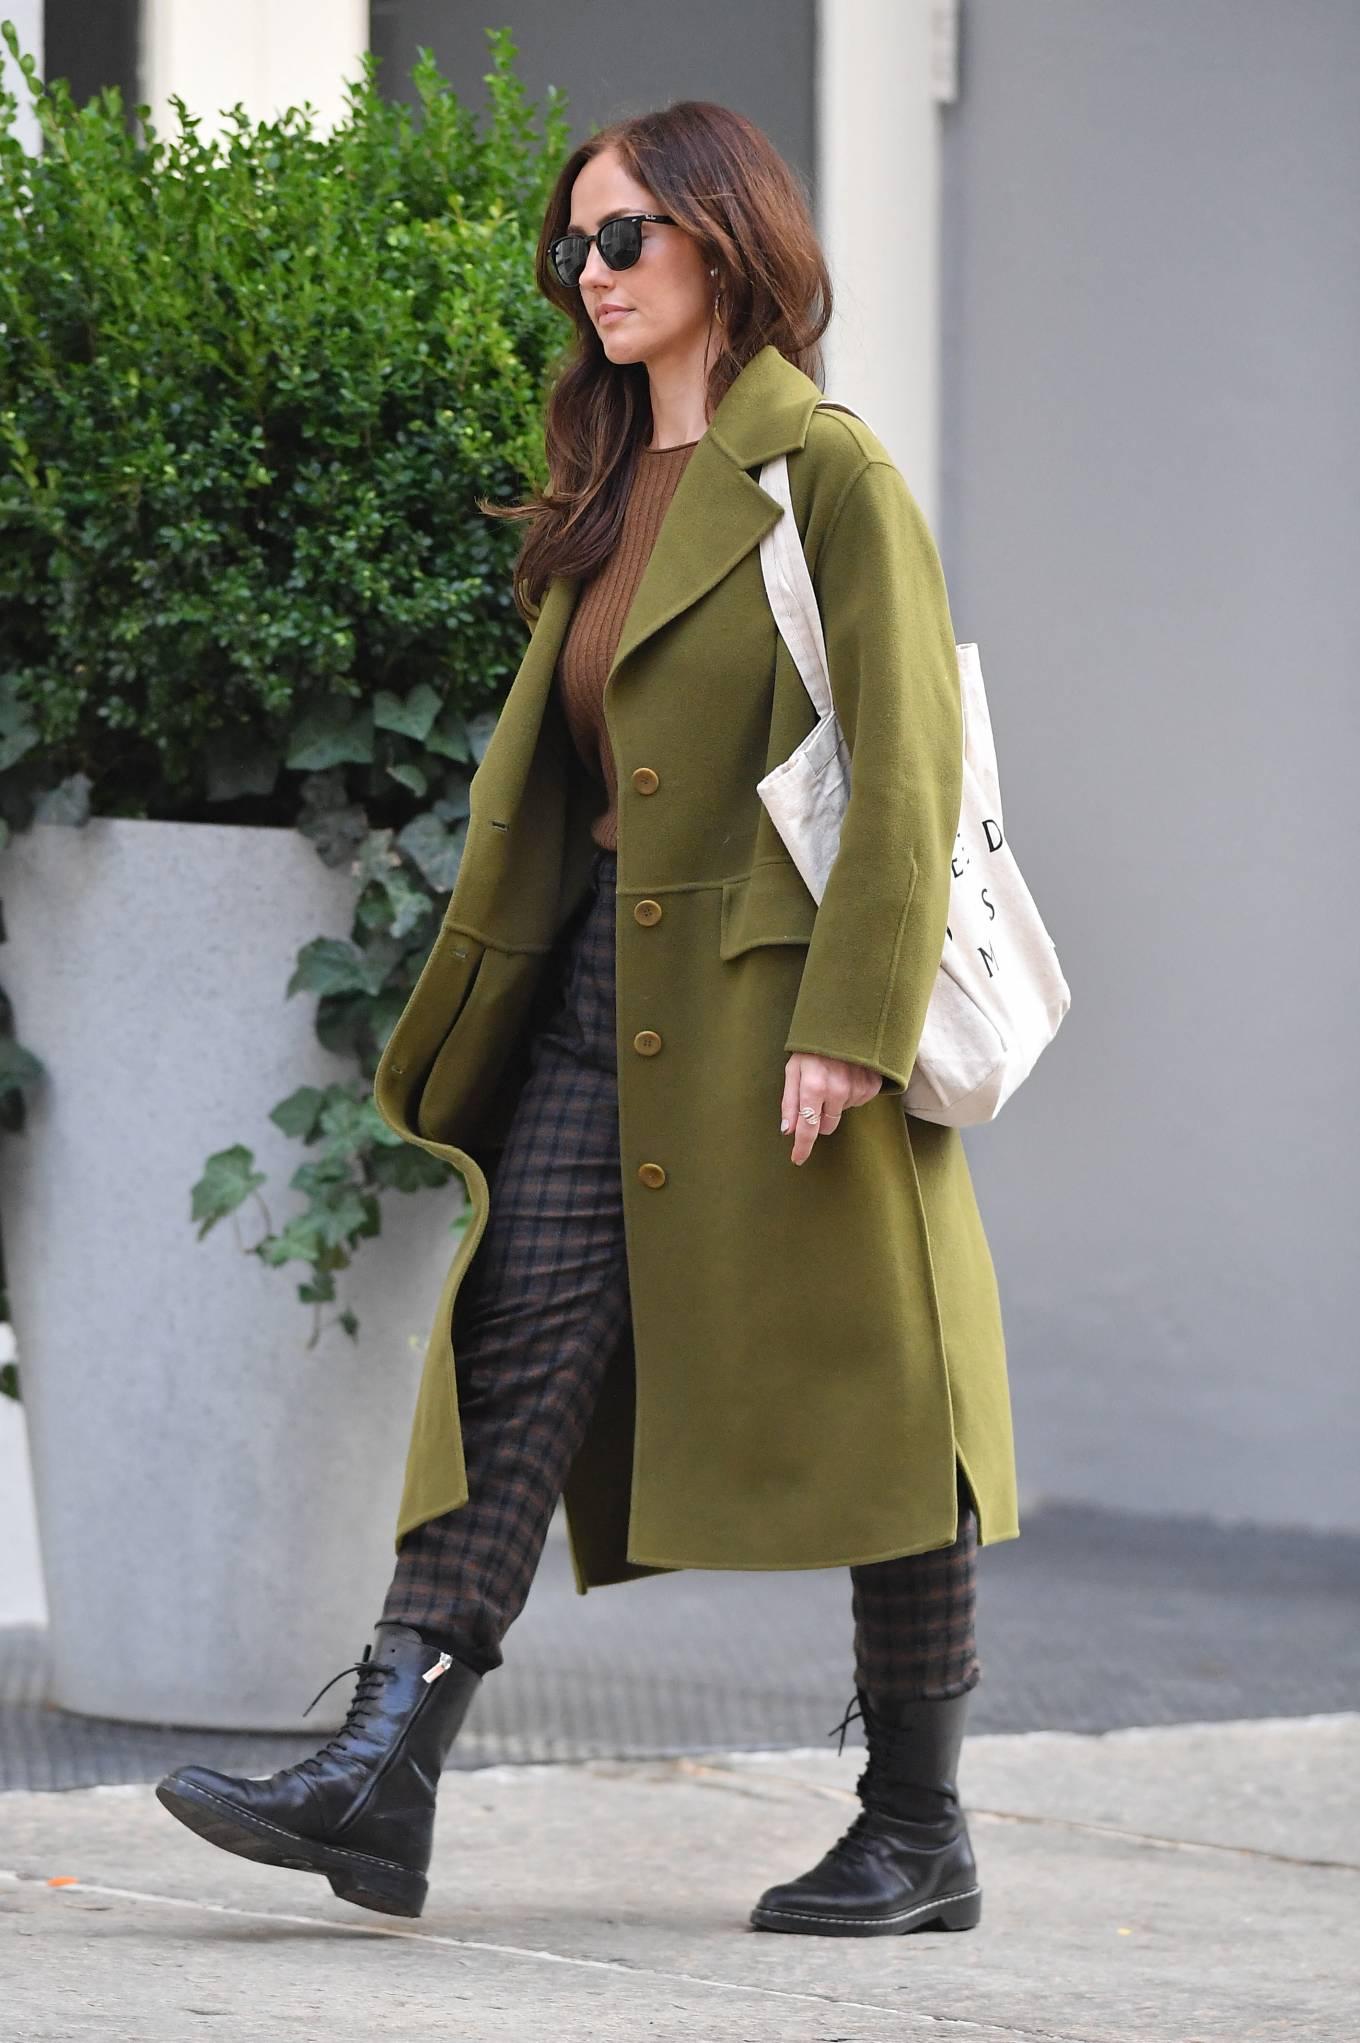 Minka Kelly 2021 : Minka Kelly – In olive green runs errands in New York-08